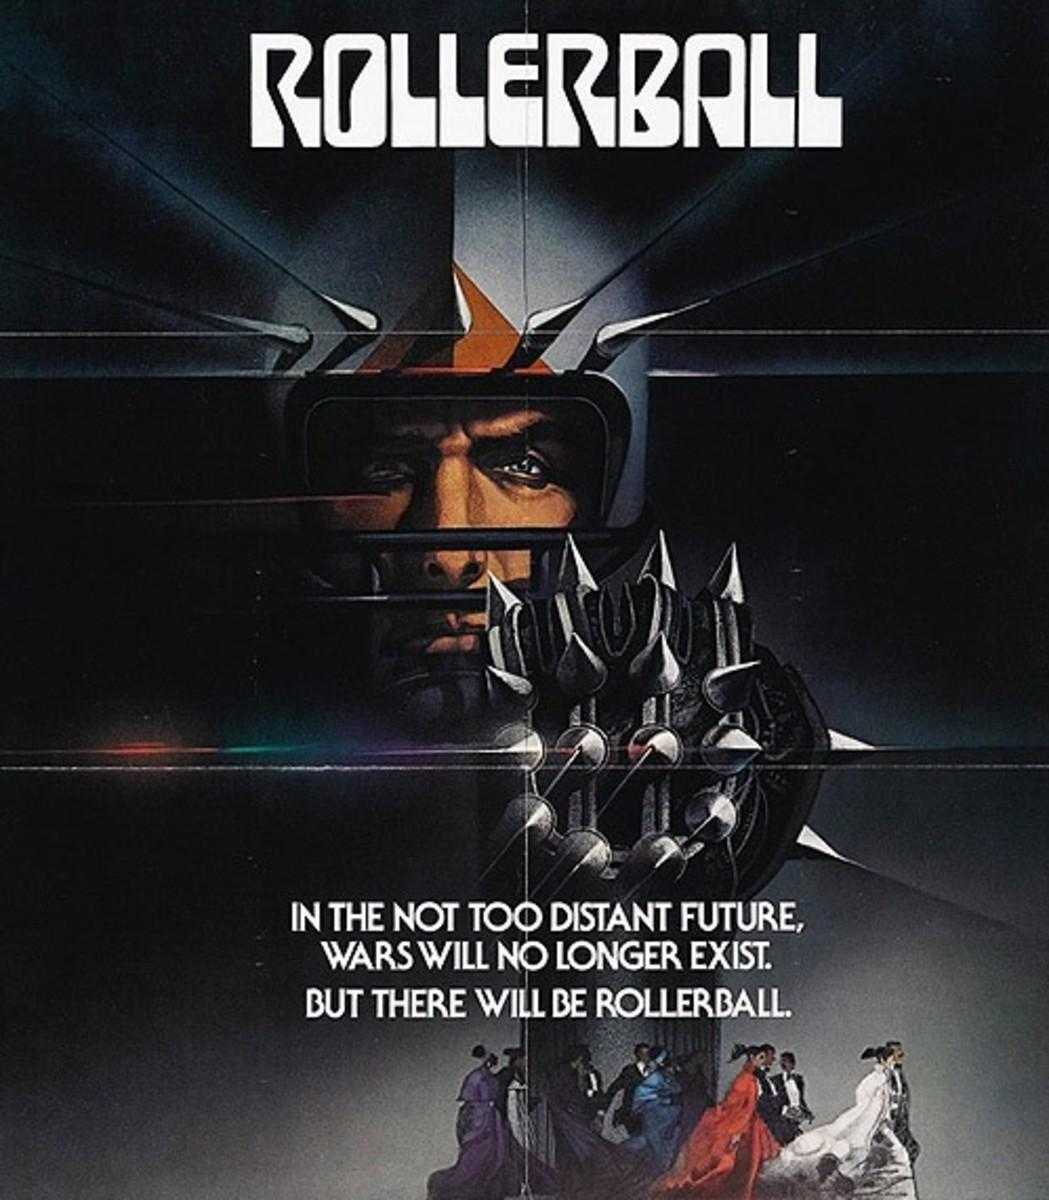 Rollerball (1975) art by Bob Peak